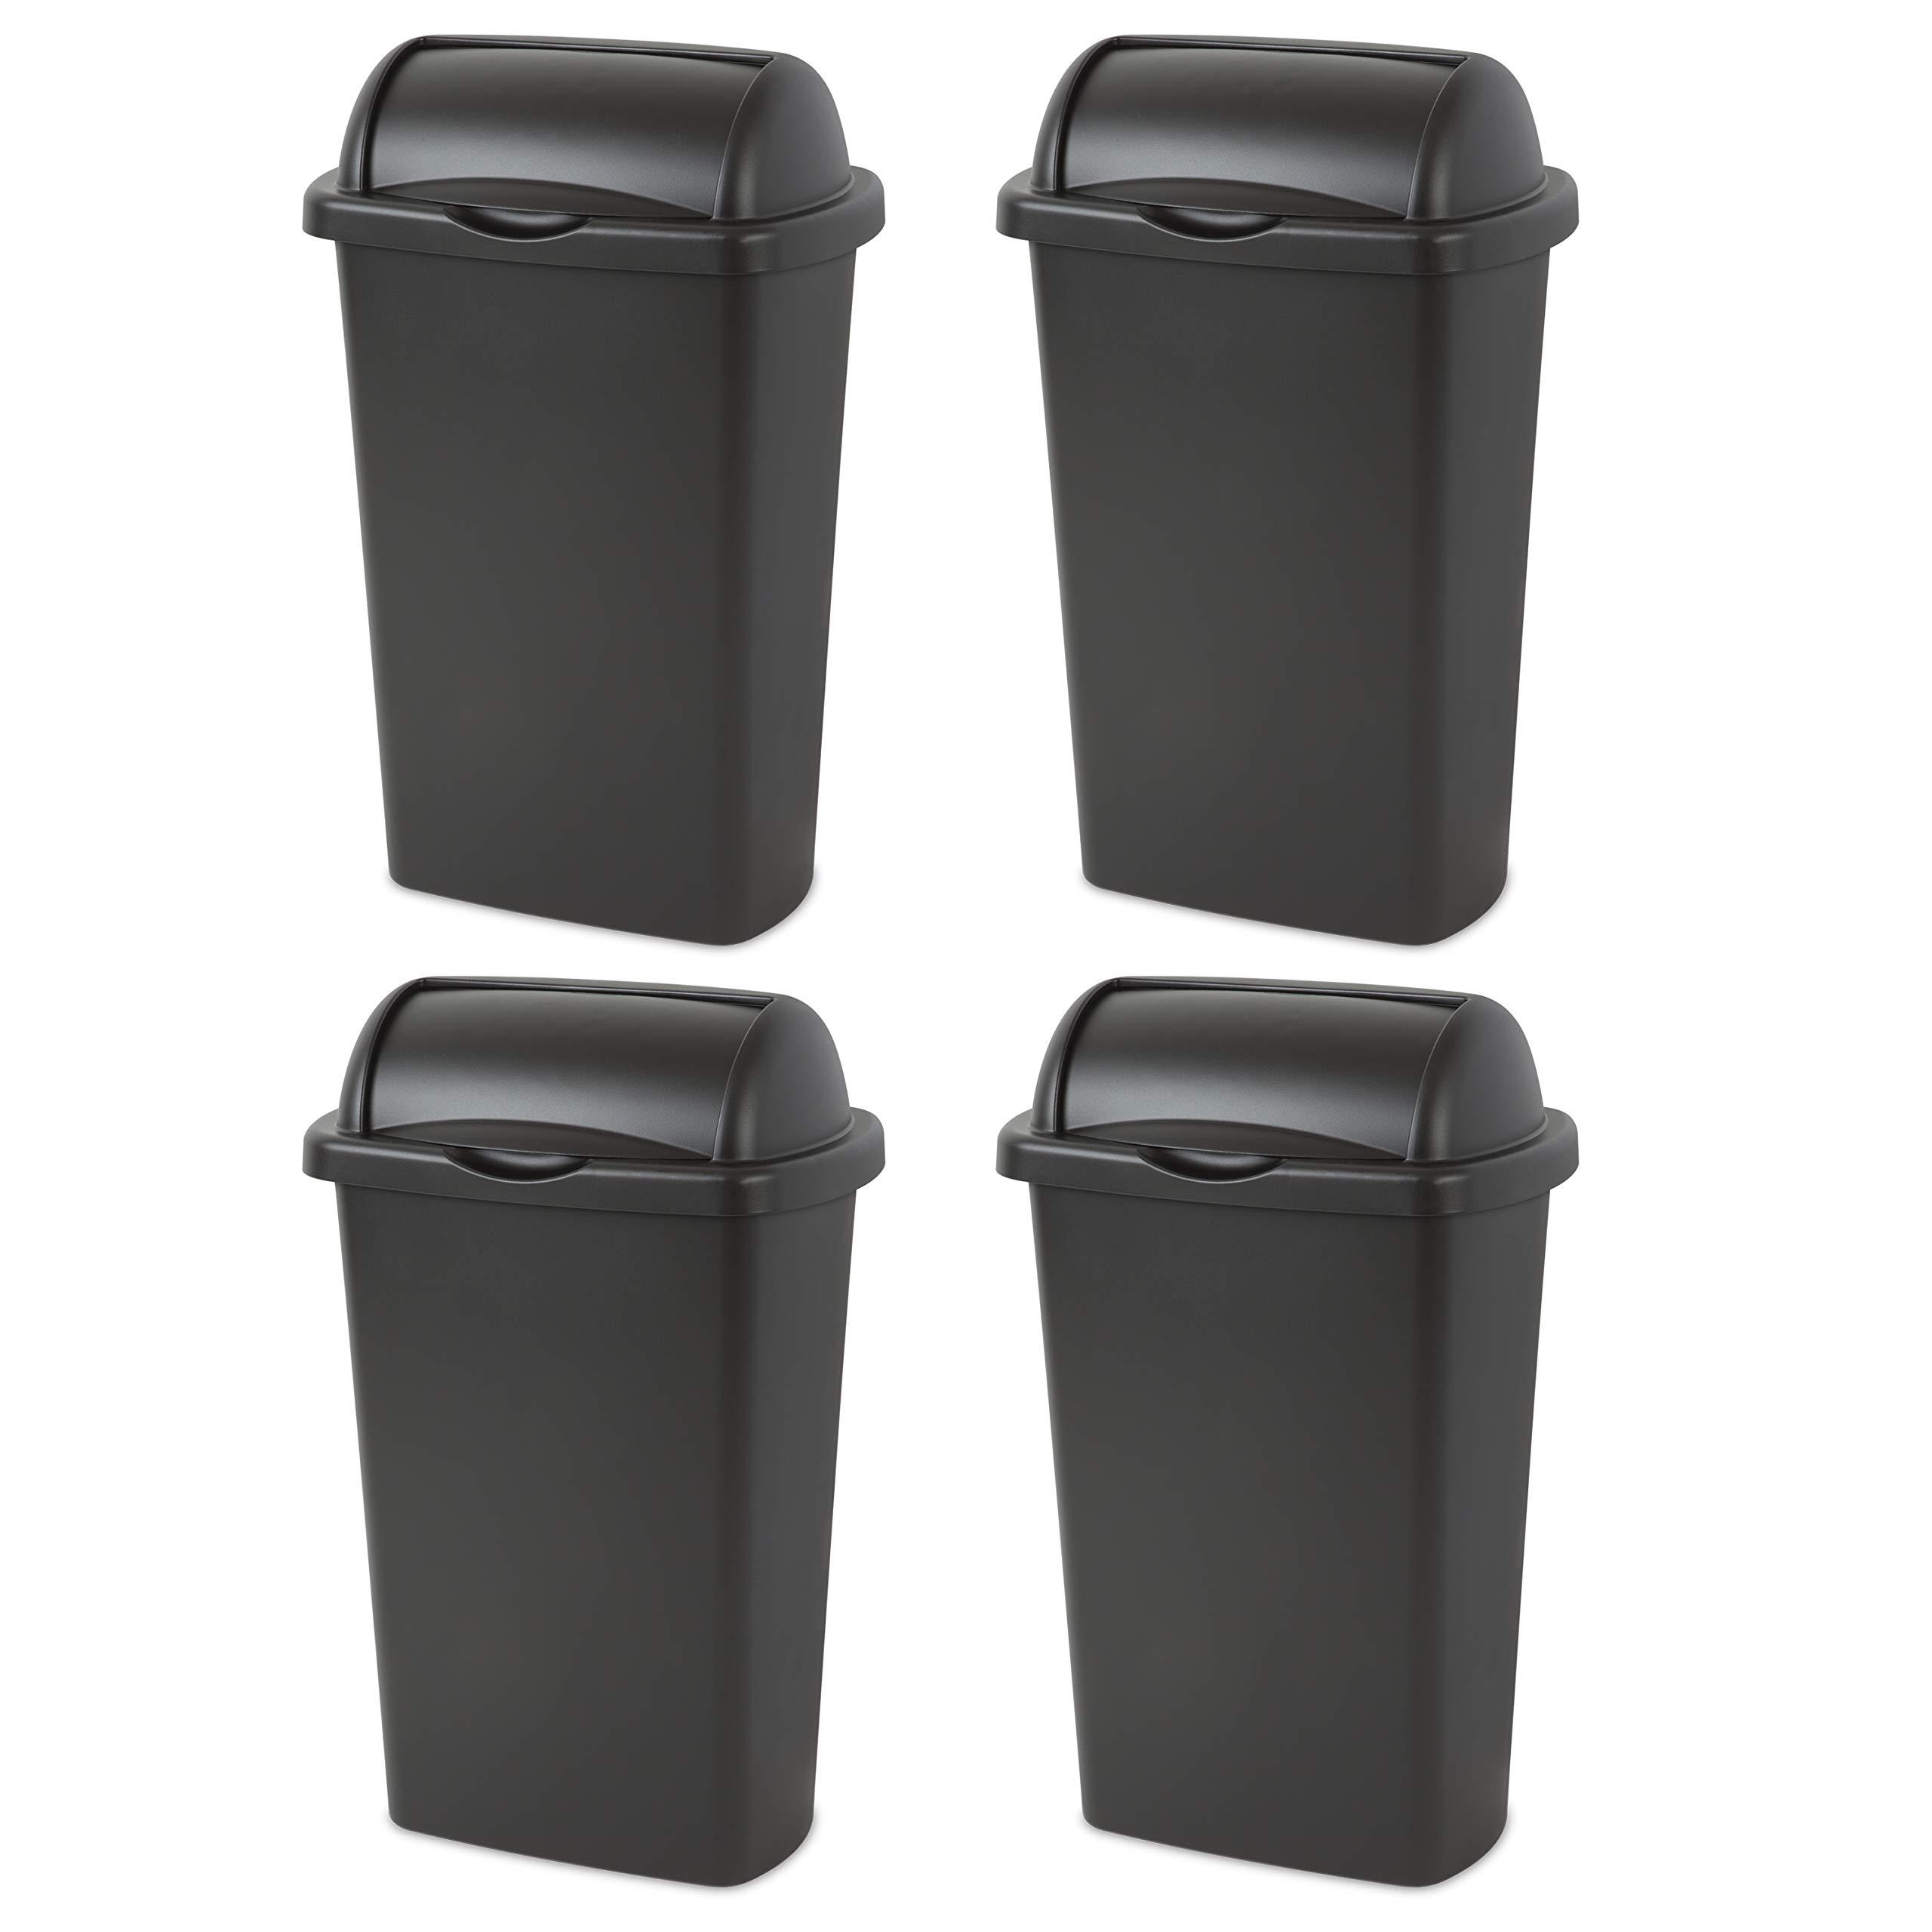 STERILITE, 13 Gal./49 L Roll Top Wastebasket, Case of 4